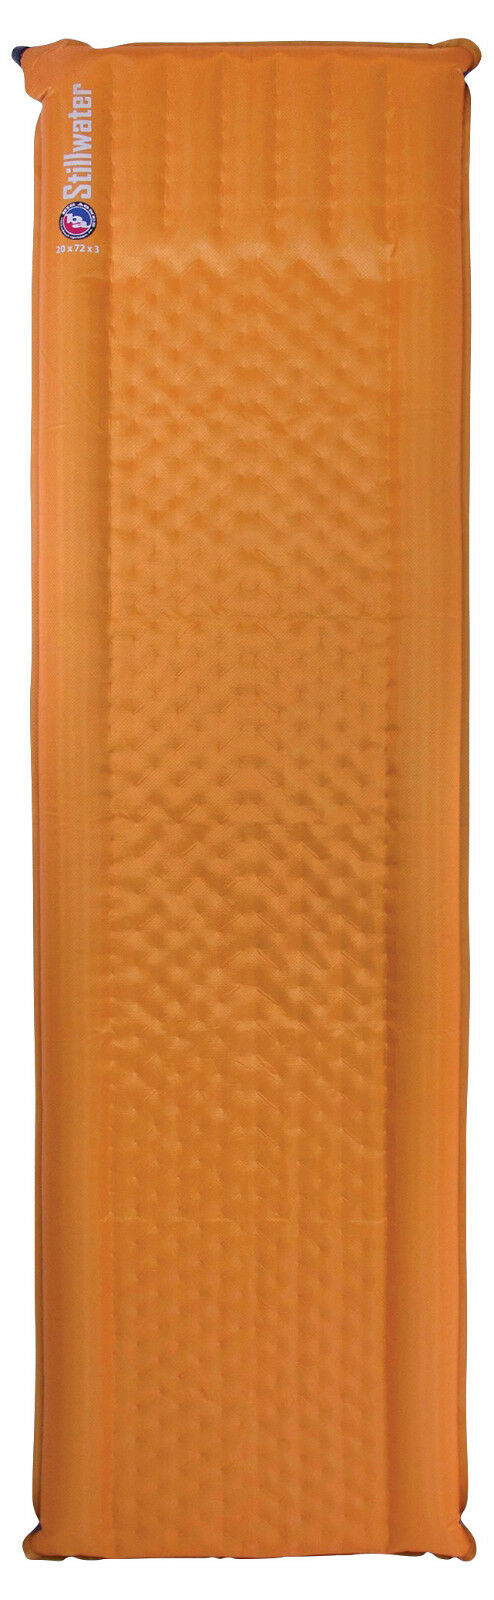 Big Agnes Stillwater Sleeping Pad - Long - Ultralight 1 lb 12 oz R-value 1.5 NEW